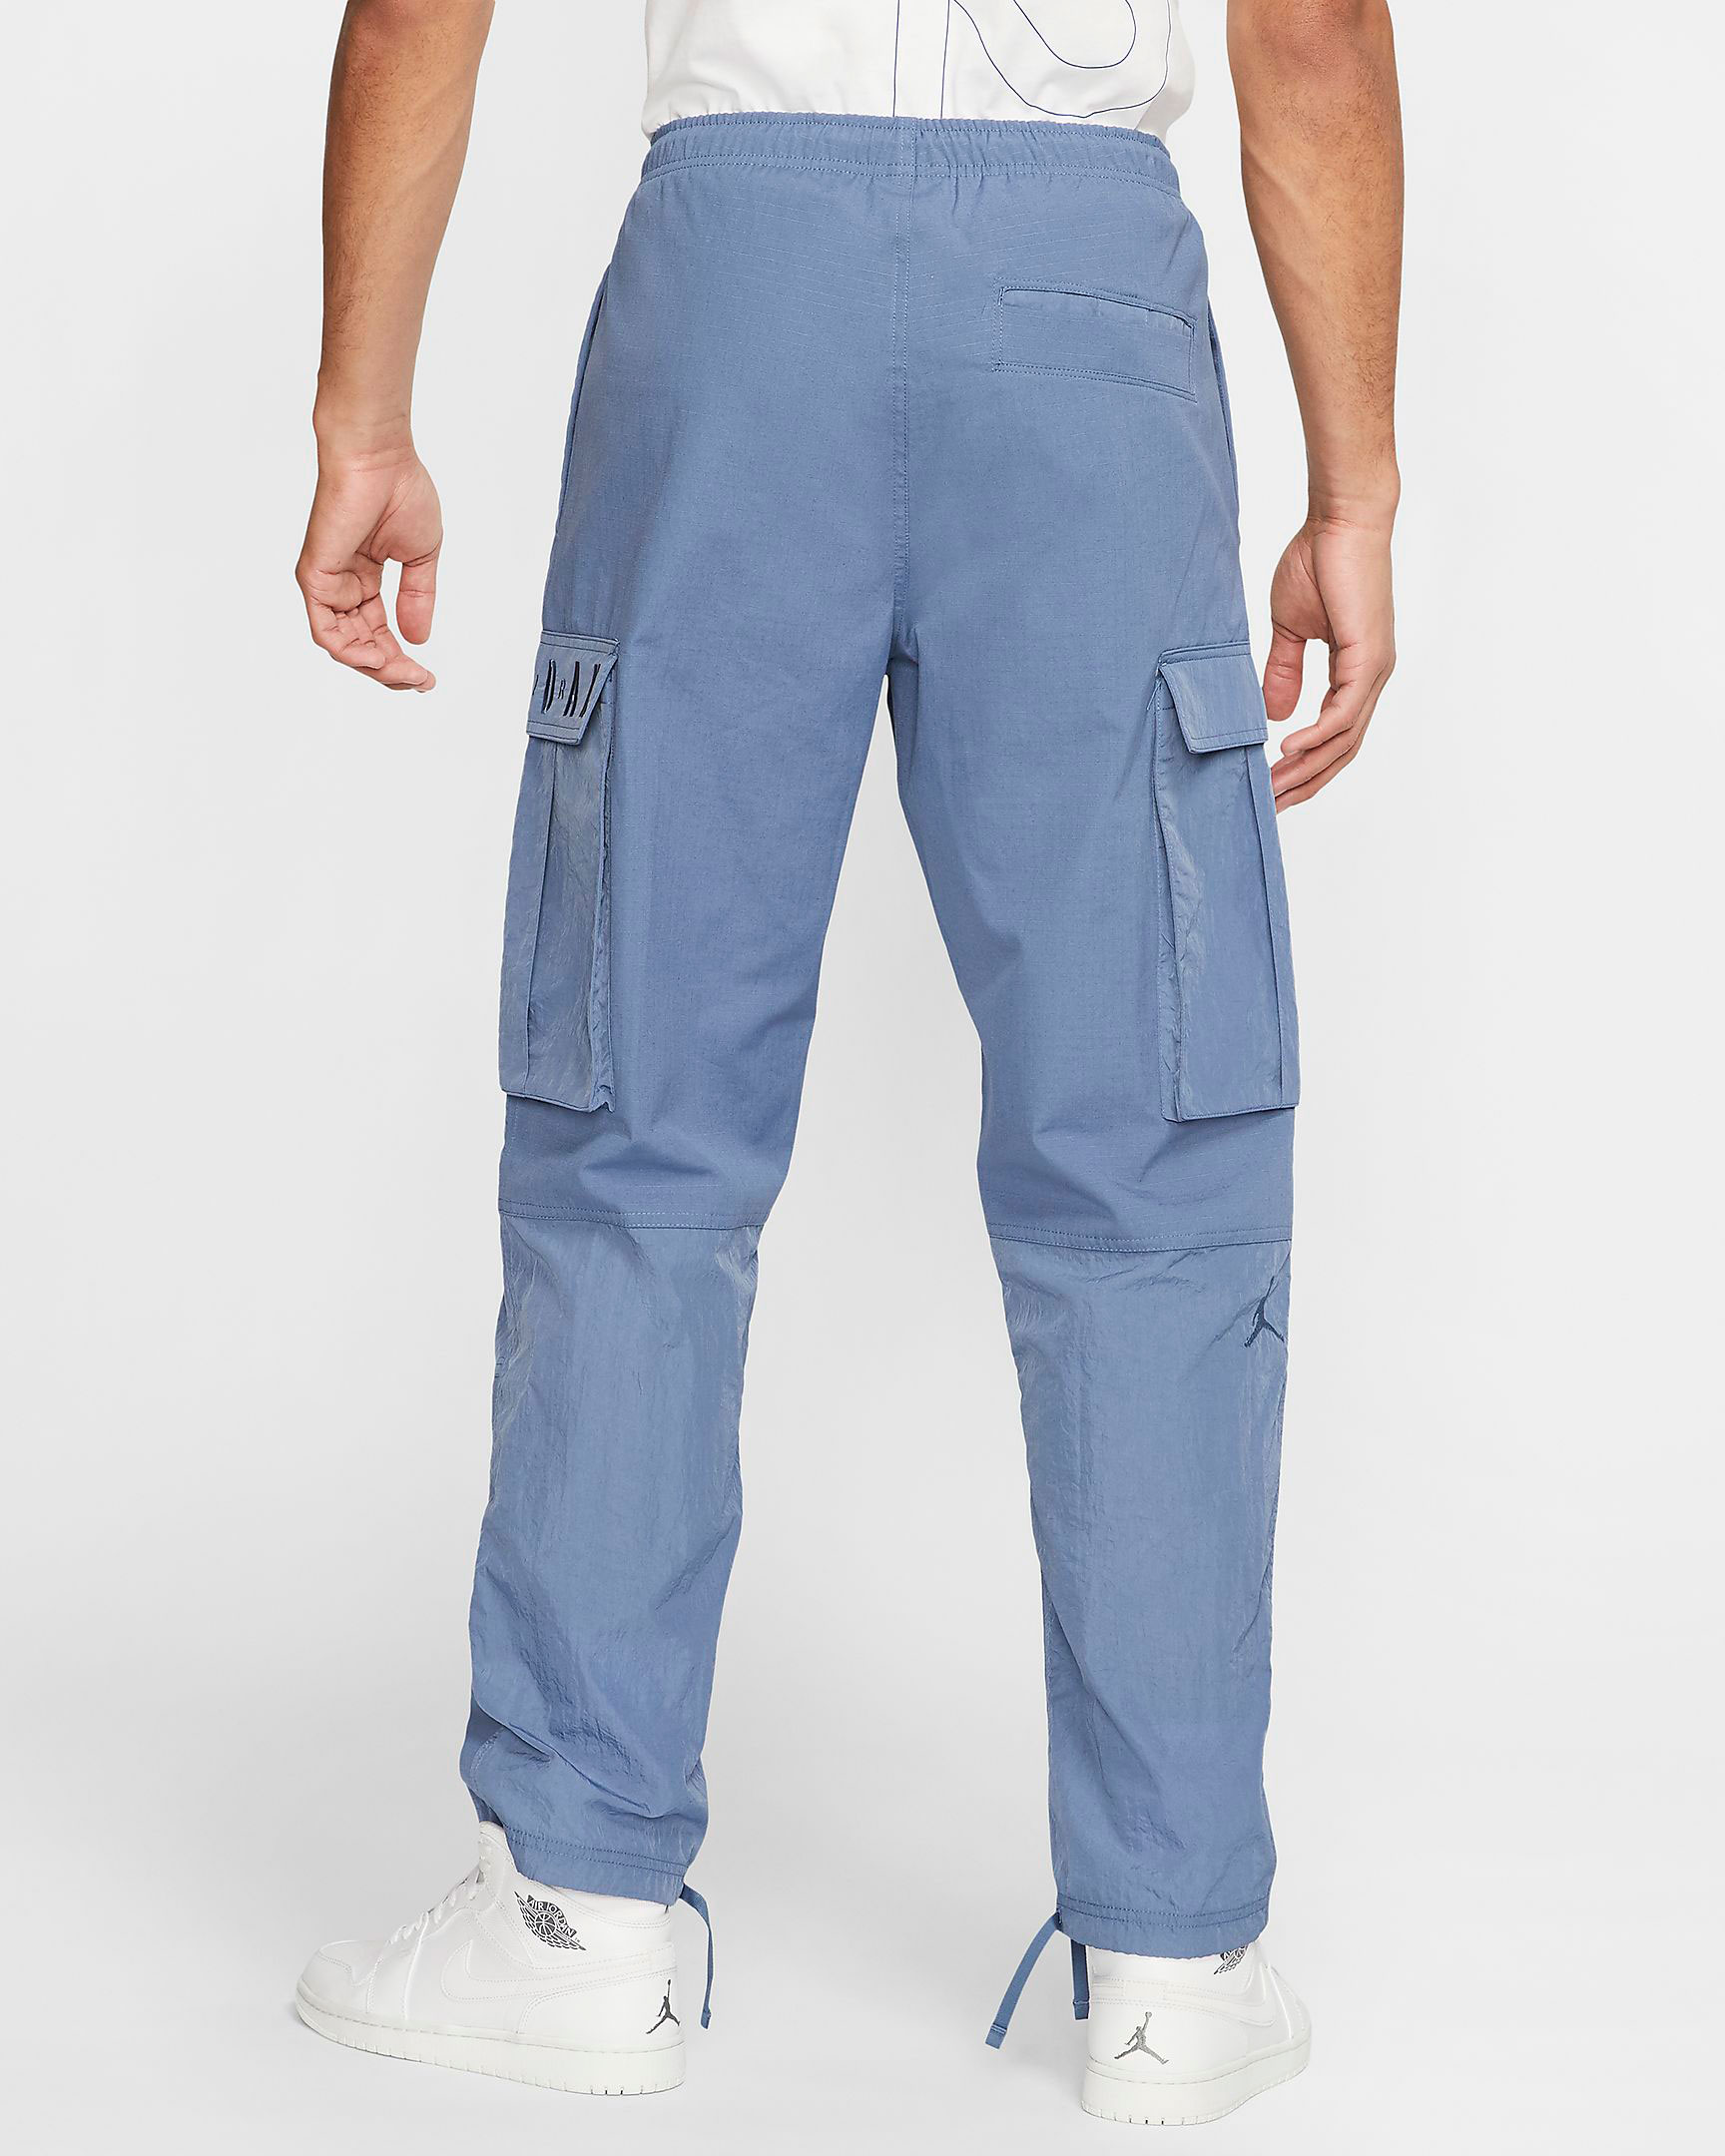 jordan-sport-dna-cargo-pants-navy-blue-2